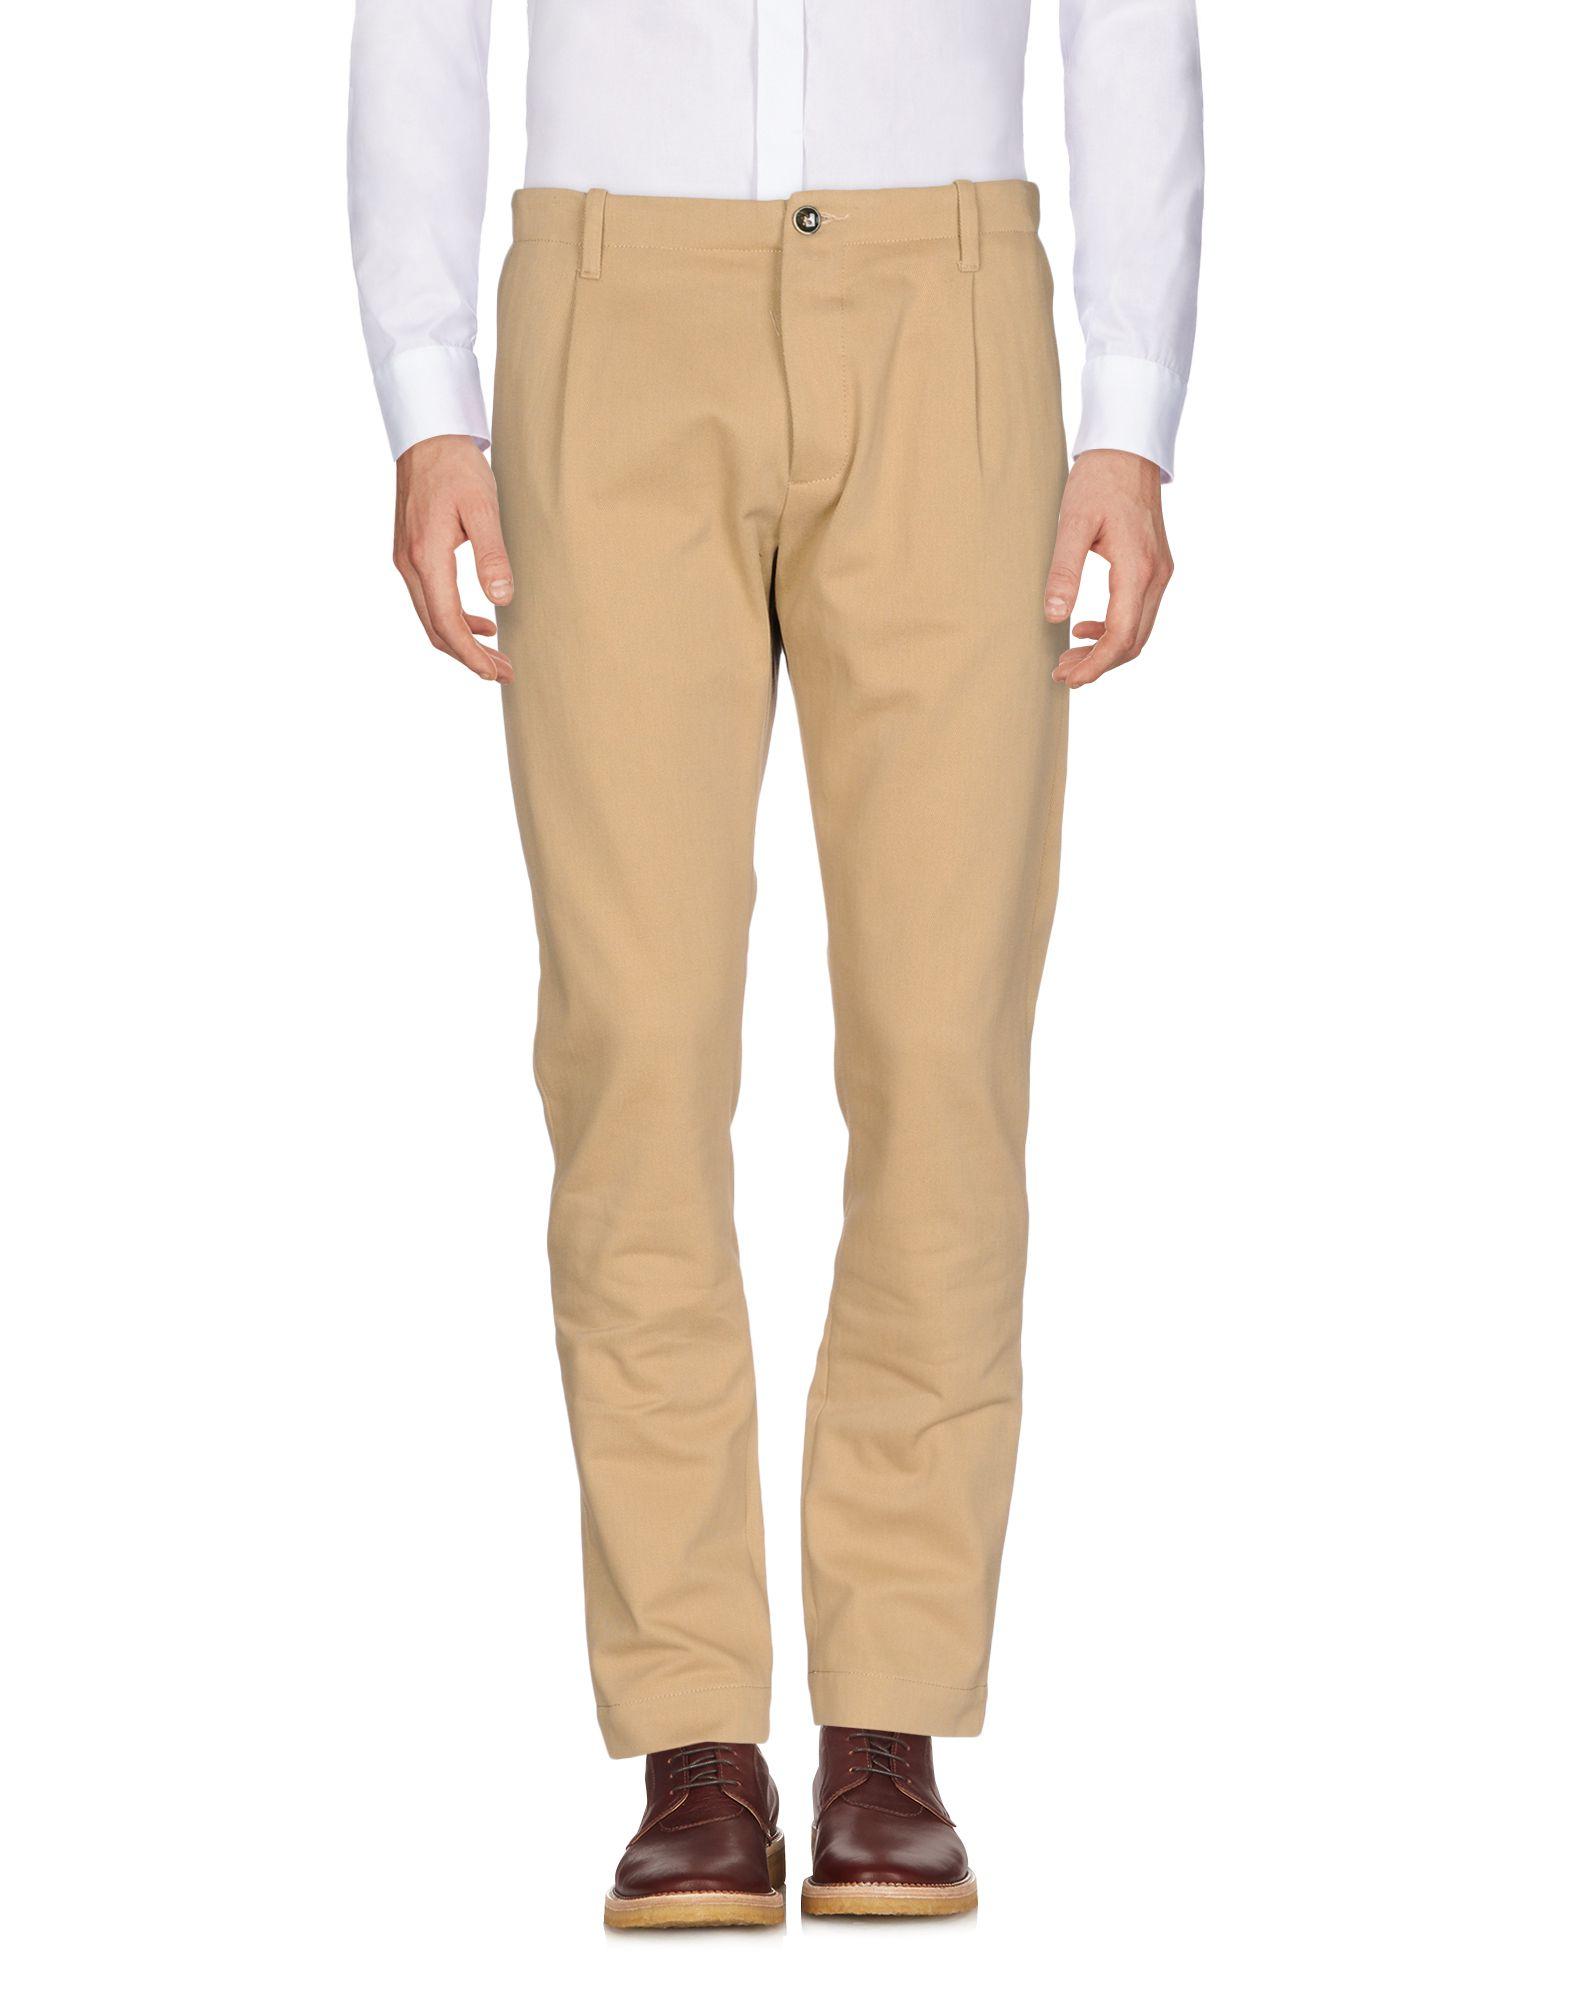 Pantalone Nine:Inthe:Morning Uomo - Acquista online su